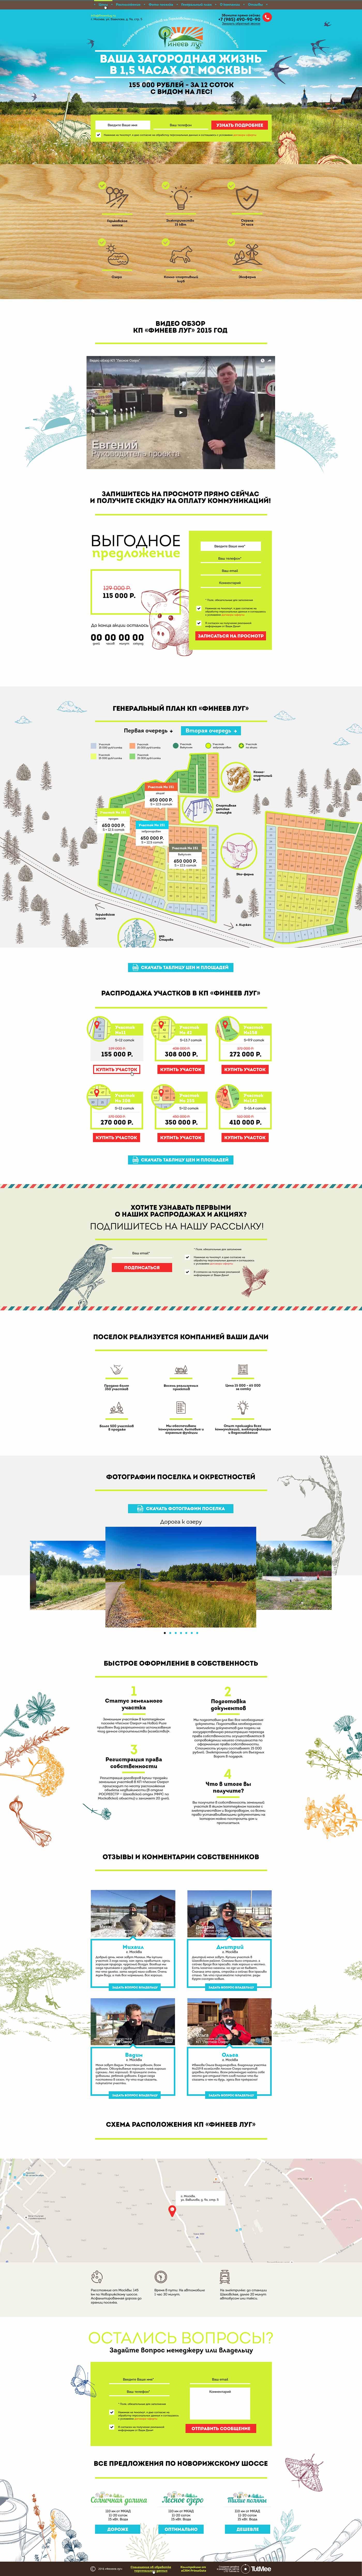 LANDING PAGE Финеев Луг